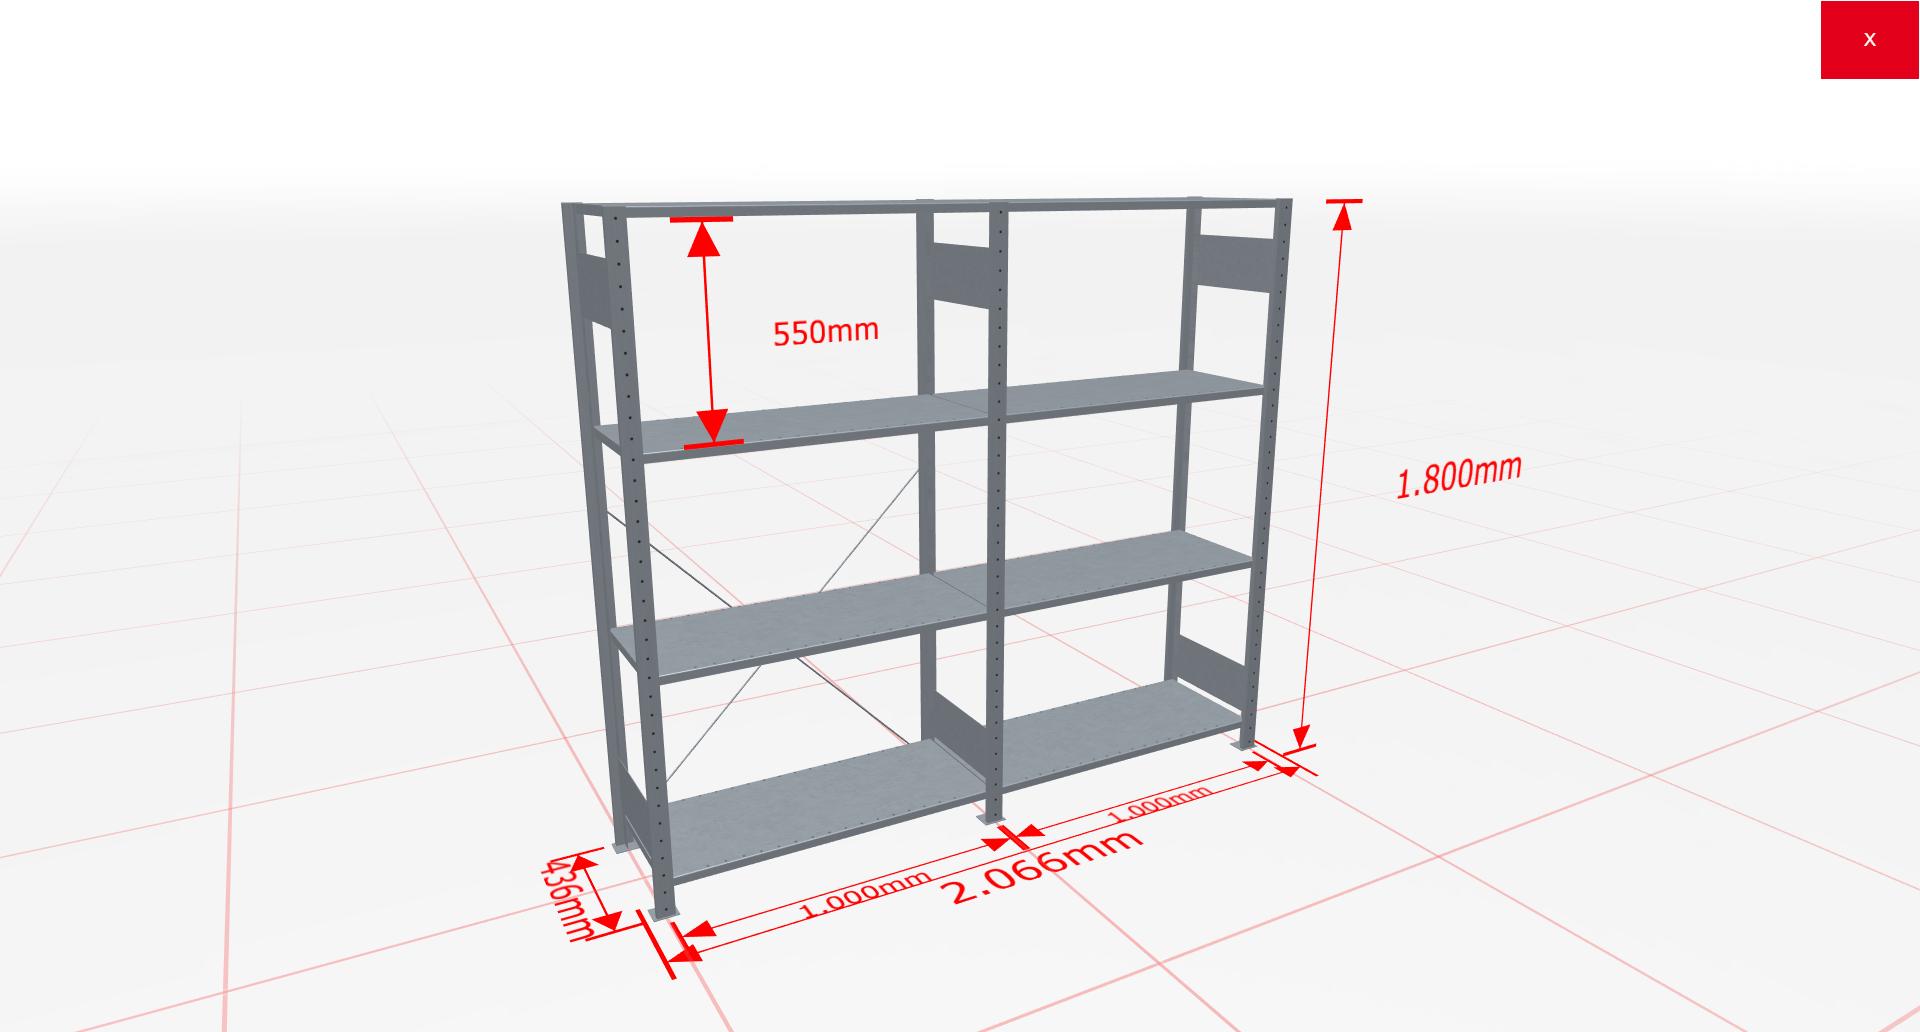 Fachbodenregal Komplettregal 1800x2066x400 mm (HxBxT) SCHULTE Lagertechnik verzinkt 4 Ebenen  150 kg je Boden